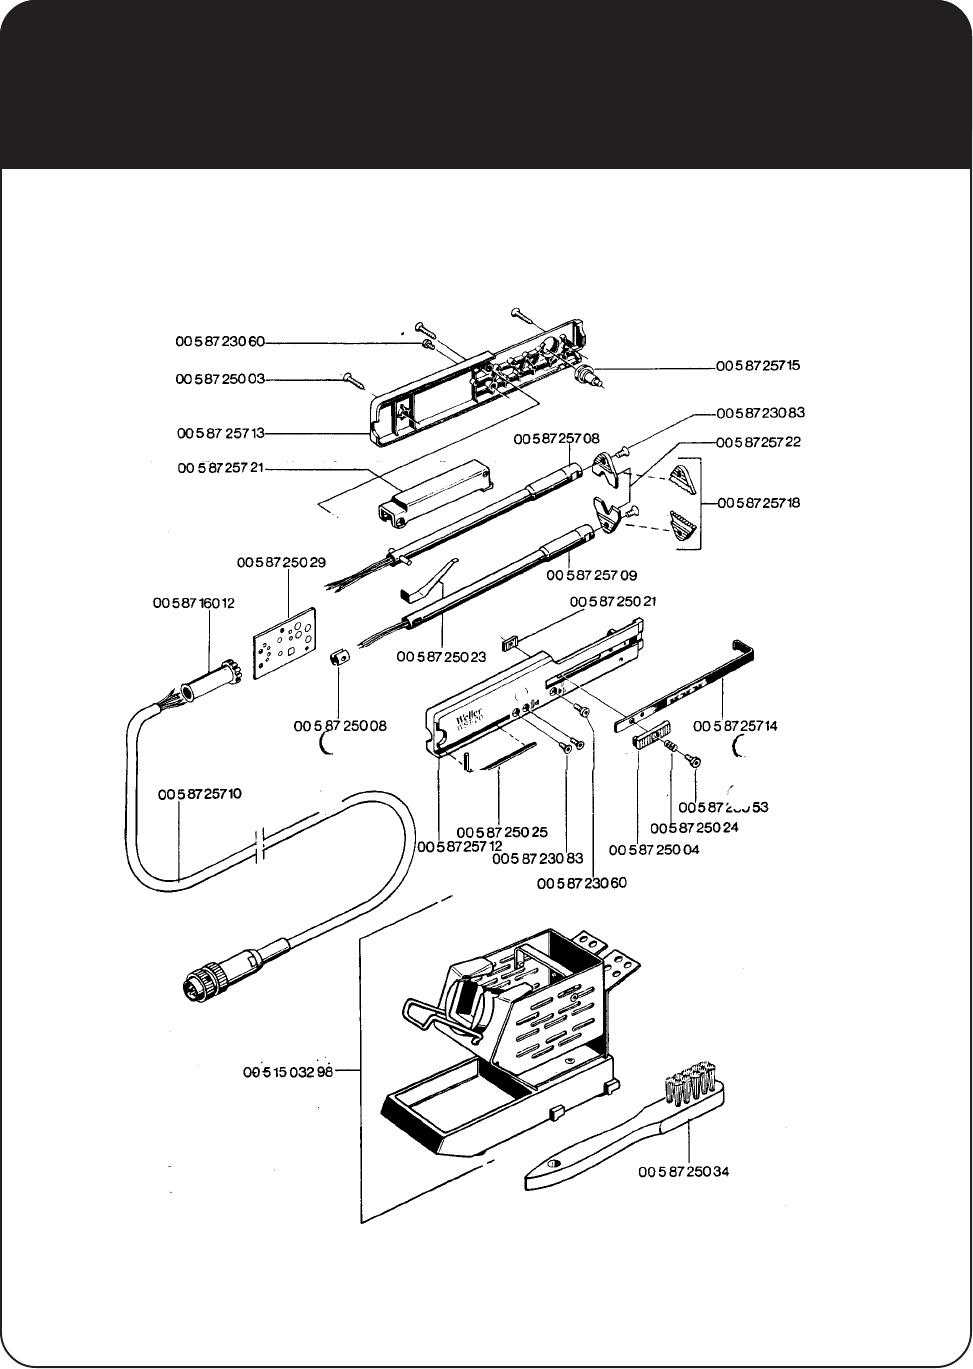 Weller Part 1 Parts Catalog